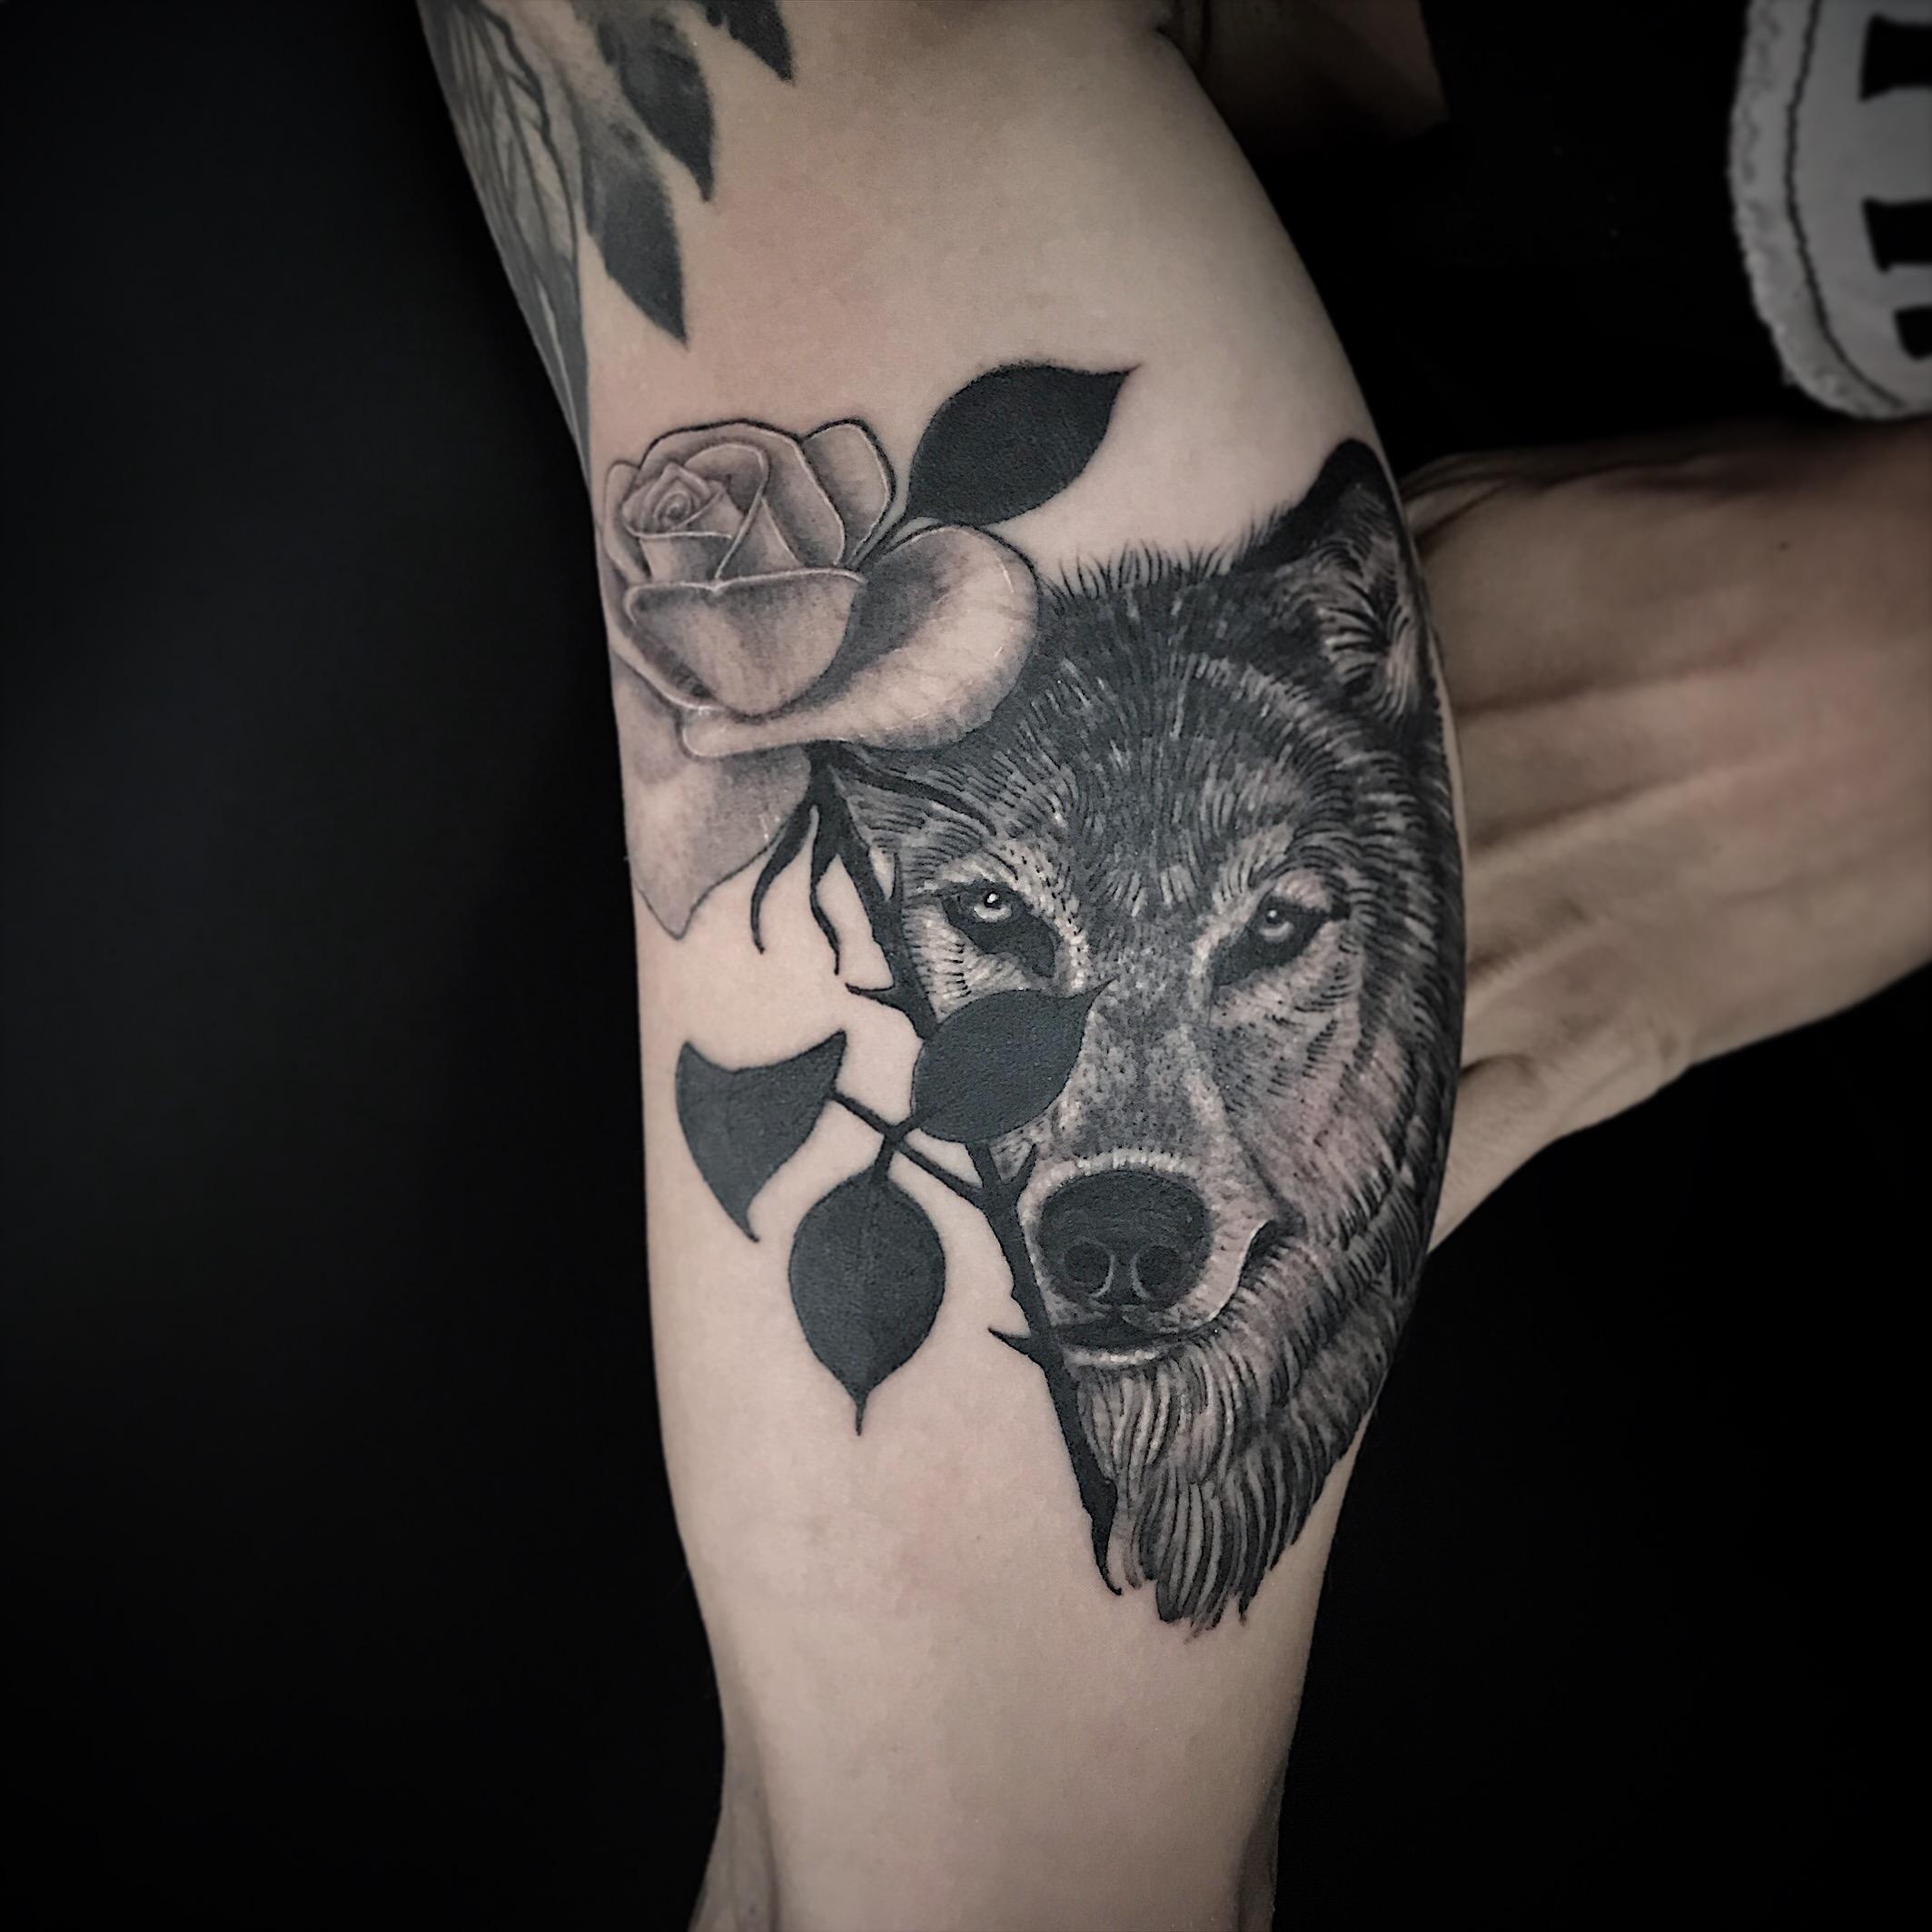 Gustavo Rierio tattoo 7.JPG